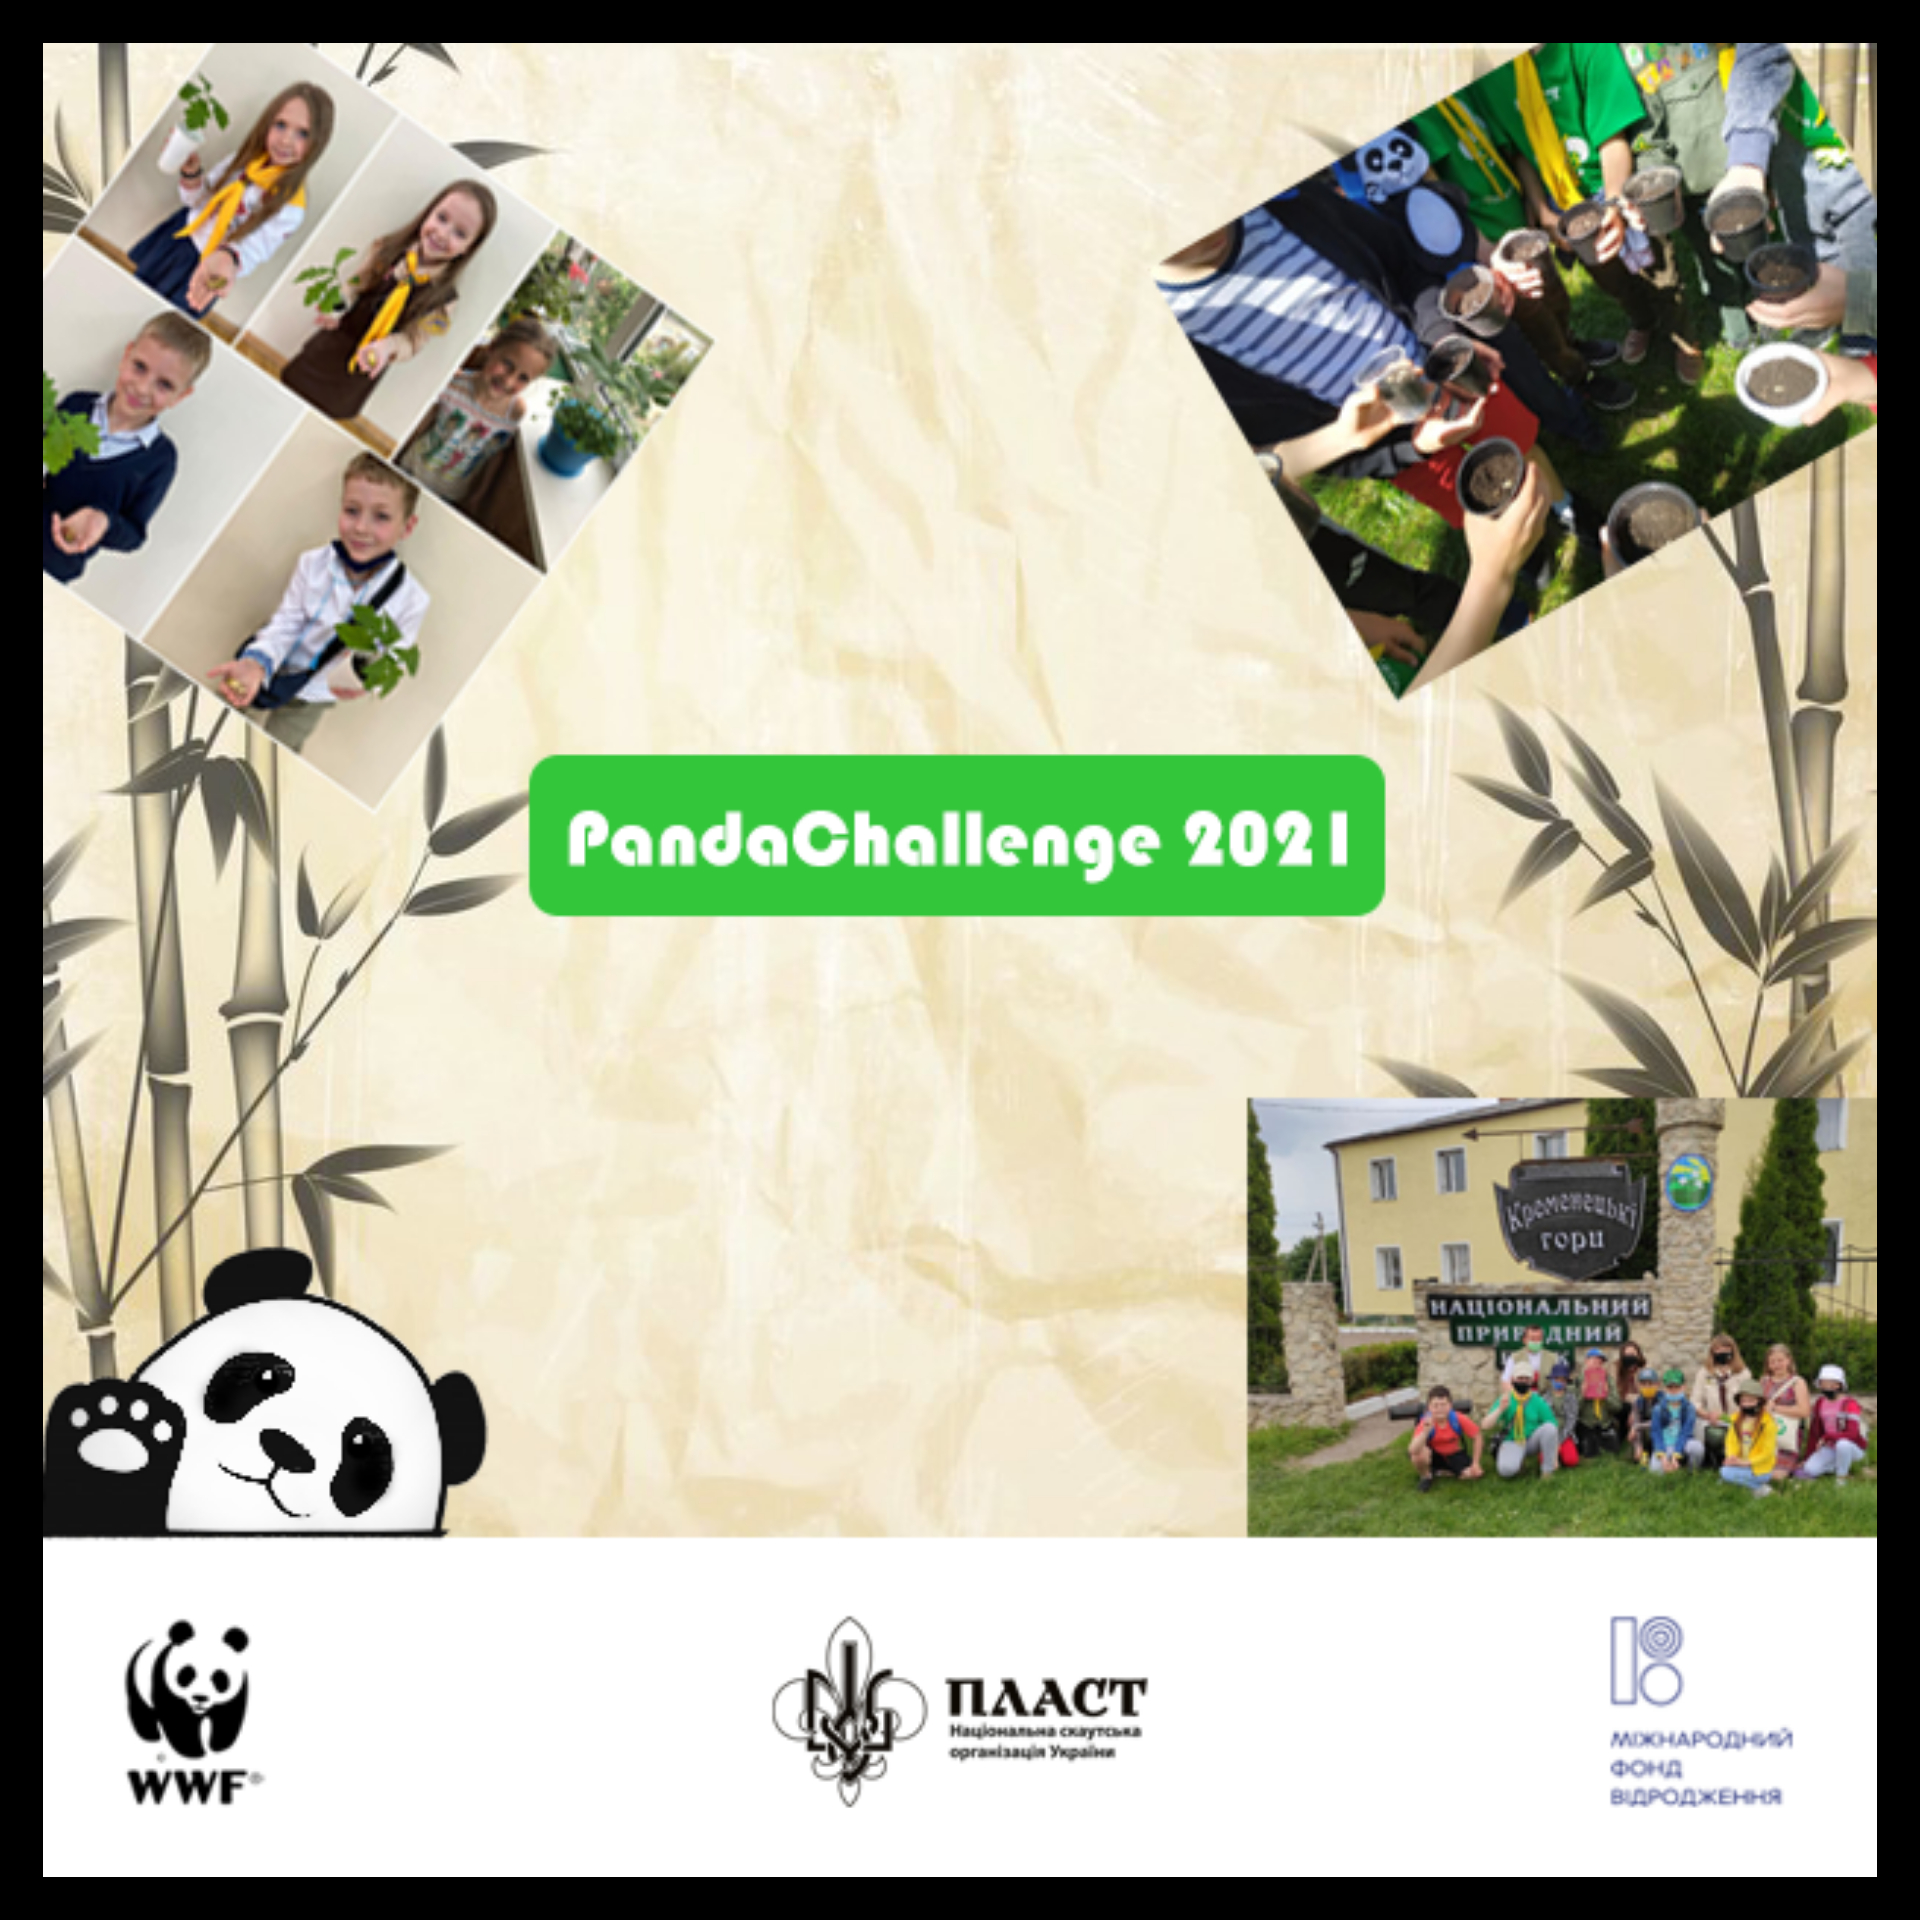 Завершення #PandaChallenge 2021